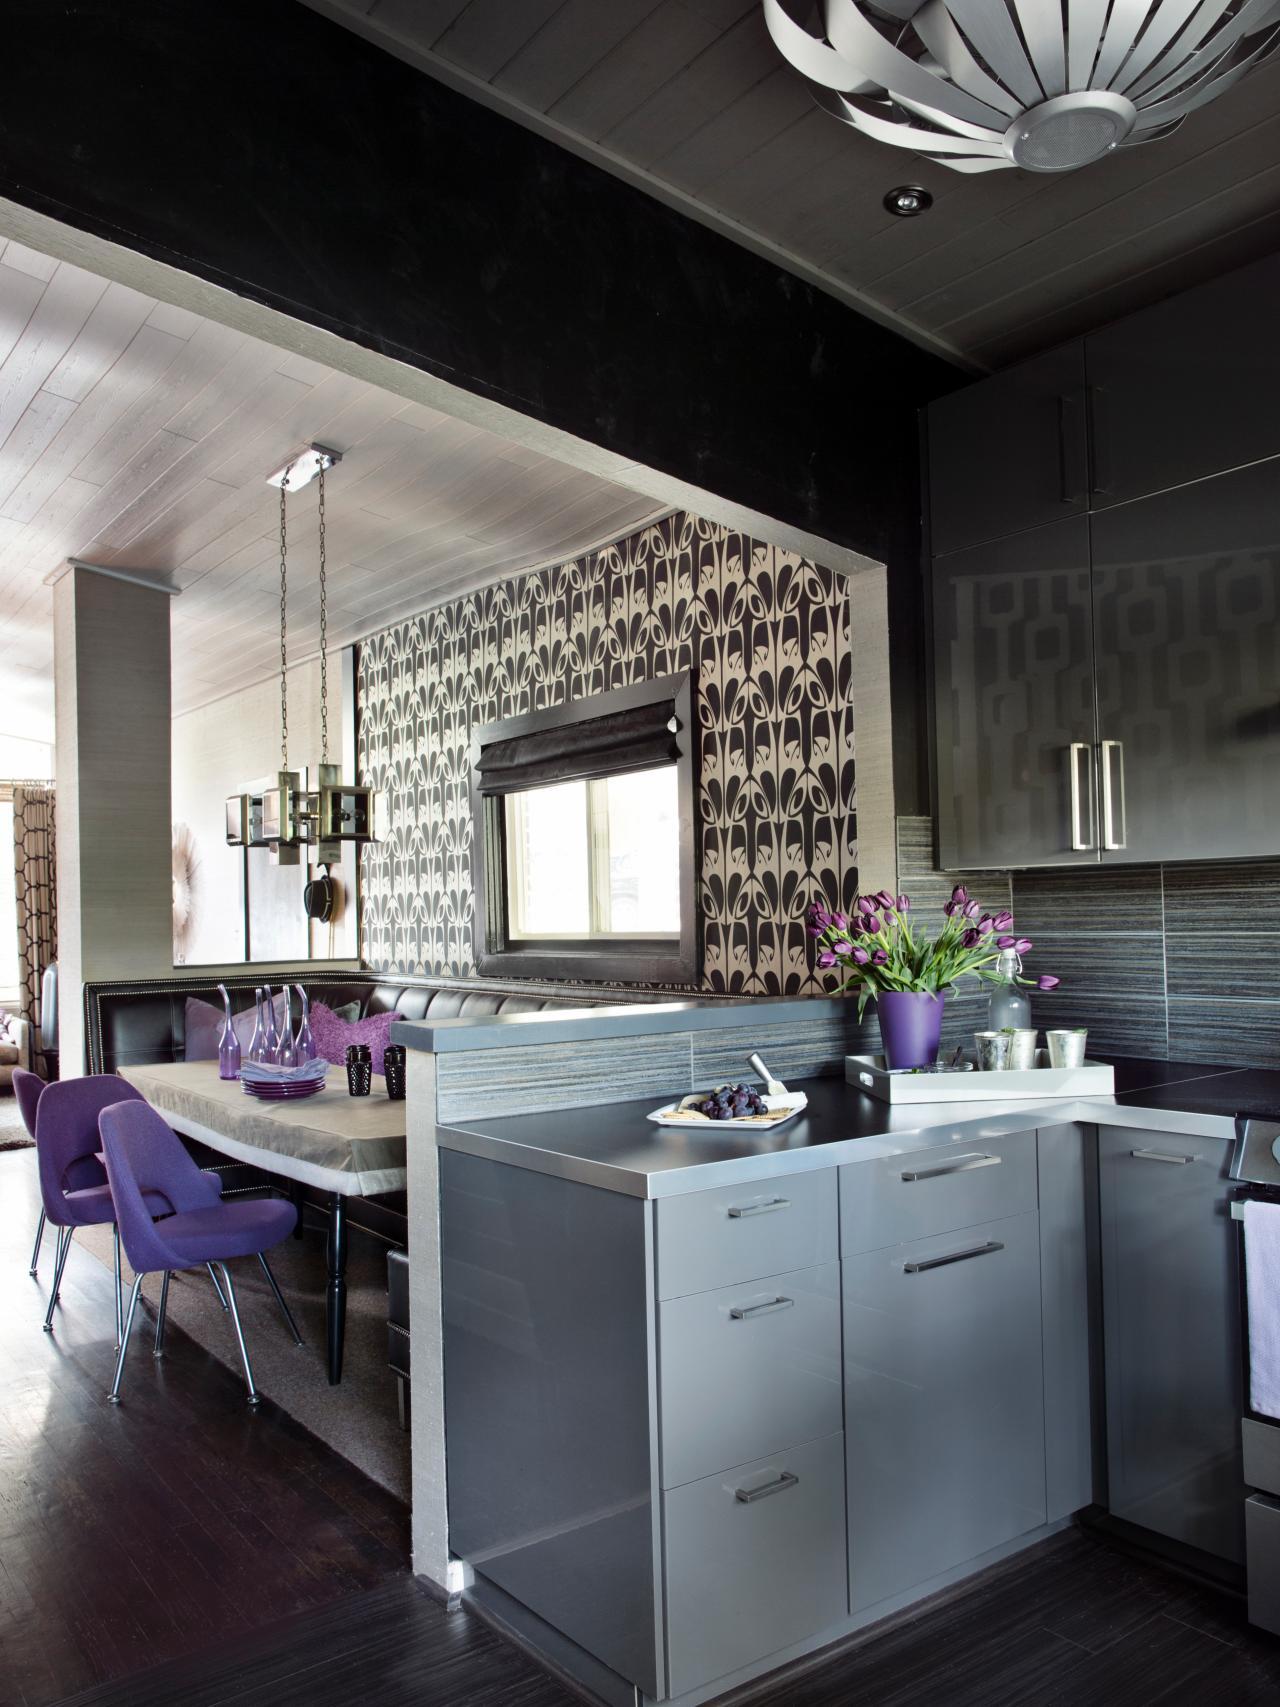 Gray Inspires Midcentury Kitchen